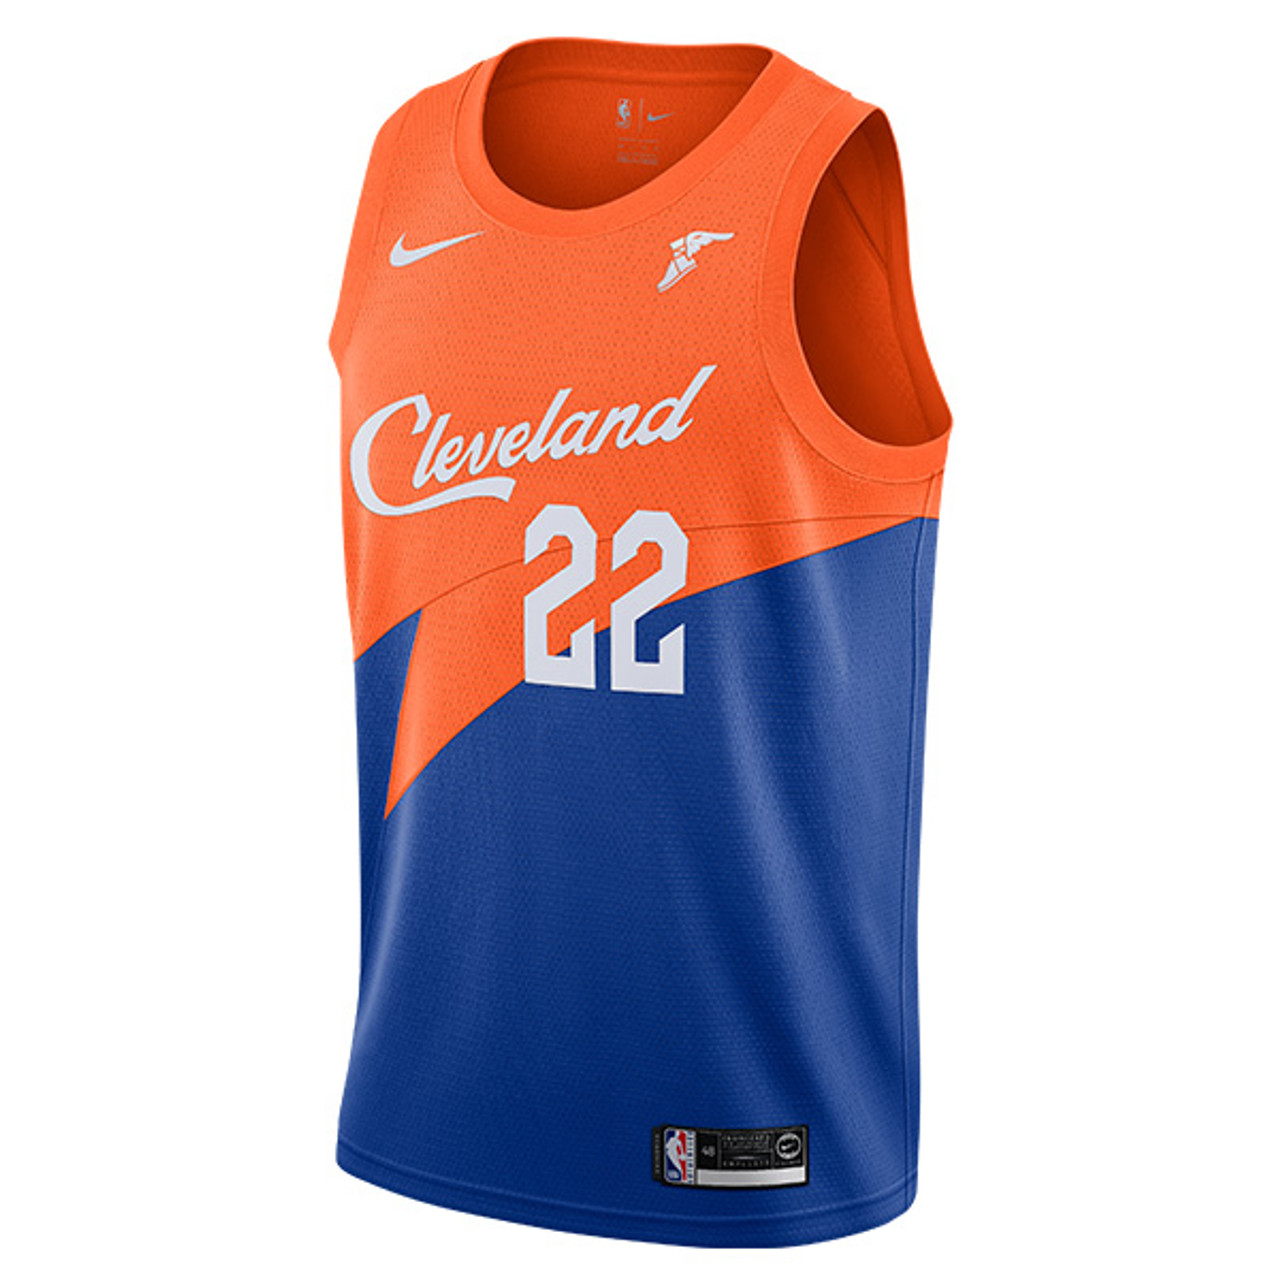 7cca7c2bad8 Royal Blue & Orange Larry Nance Jr. Cleveland City Edition Swingman Jersey  with Wingfoot